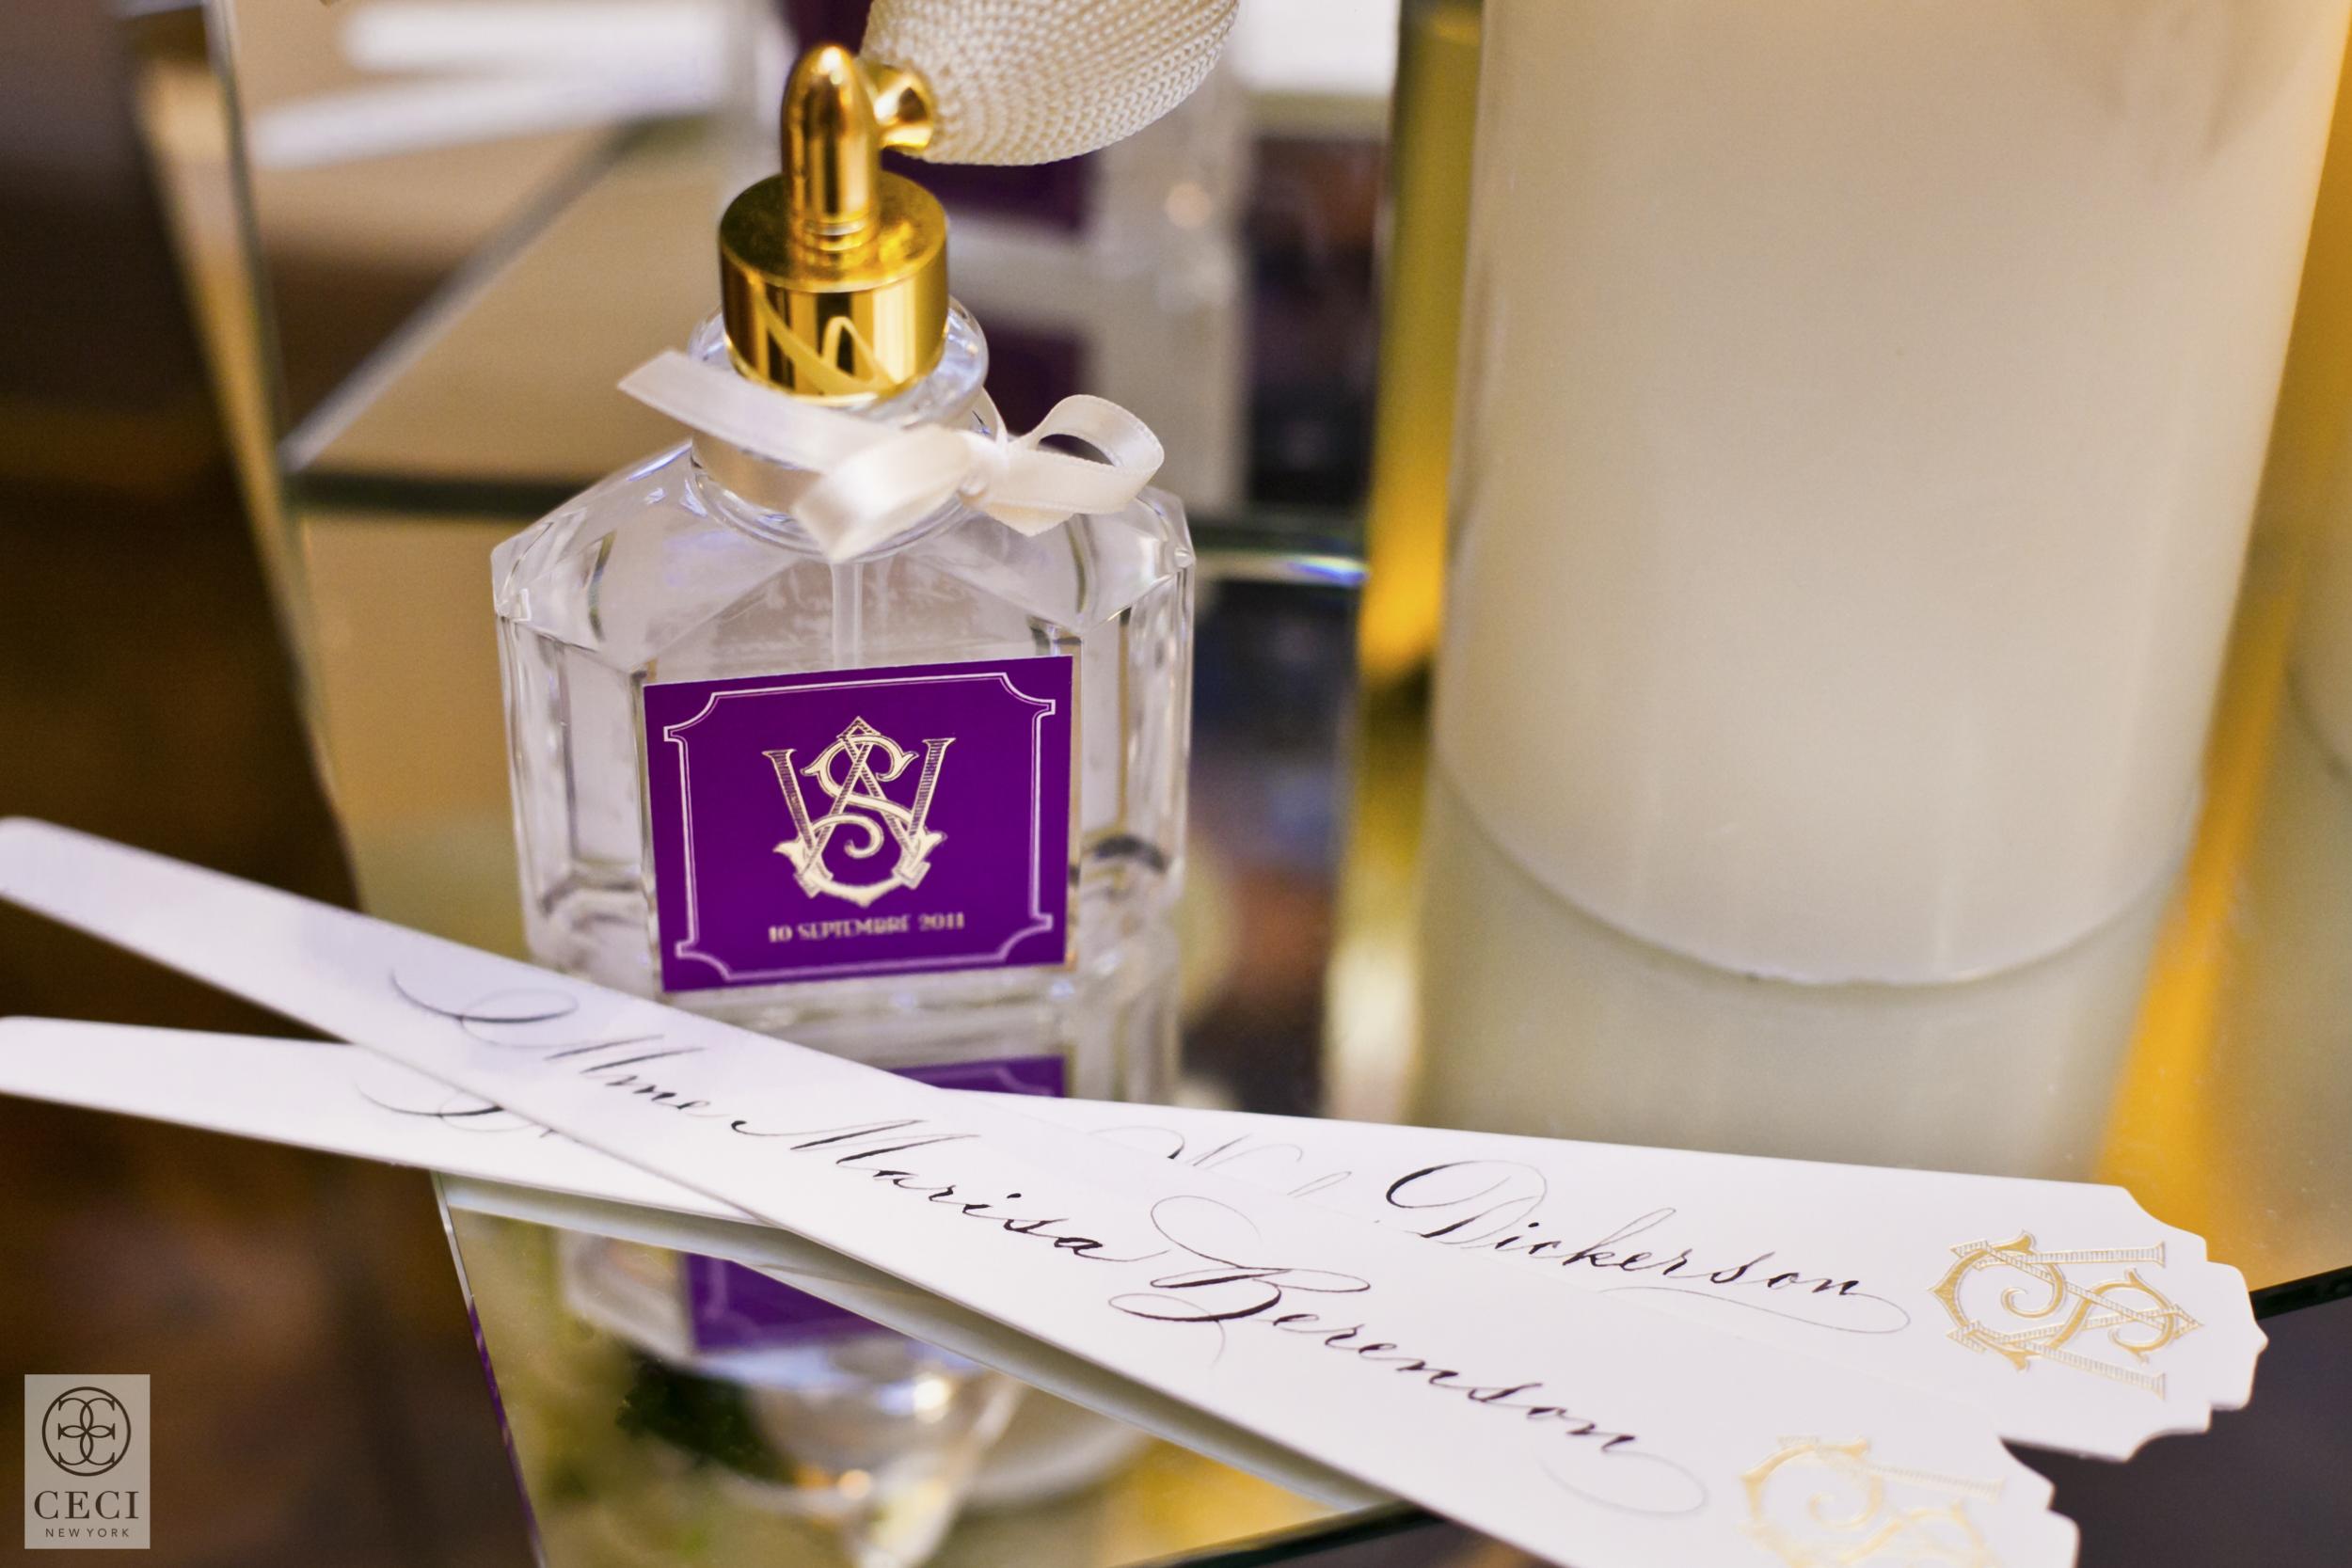 ceci_new_york_lucas_somoza_purple_regal_wediding_birthday_commitment_ceremony_invitation_logo_branding_perfume_gold_-10.jpg